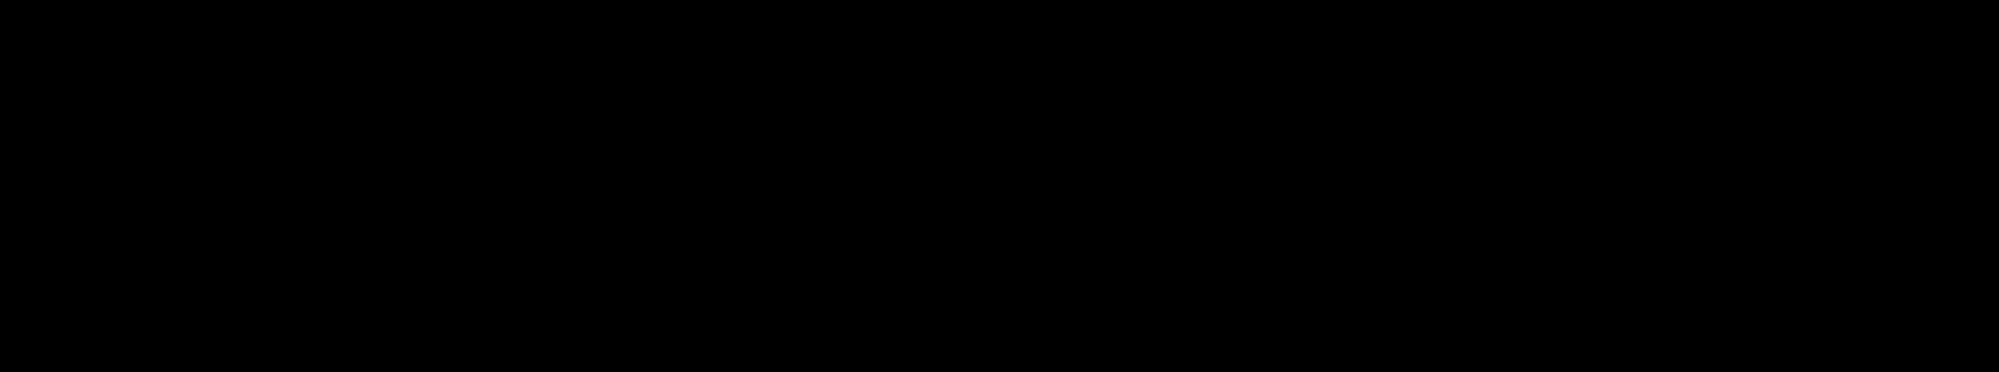 https://growthzonesitesprod.azureedge.net/wp-content/uploads/sites/1693/2020/09/Downtown-Amherst-Foundation-Logo.png